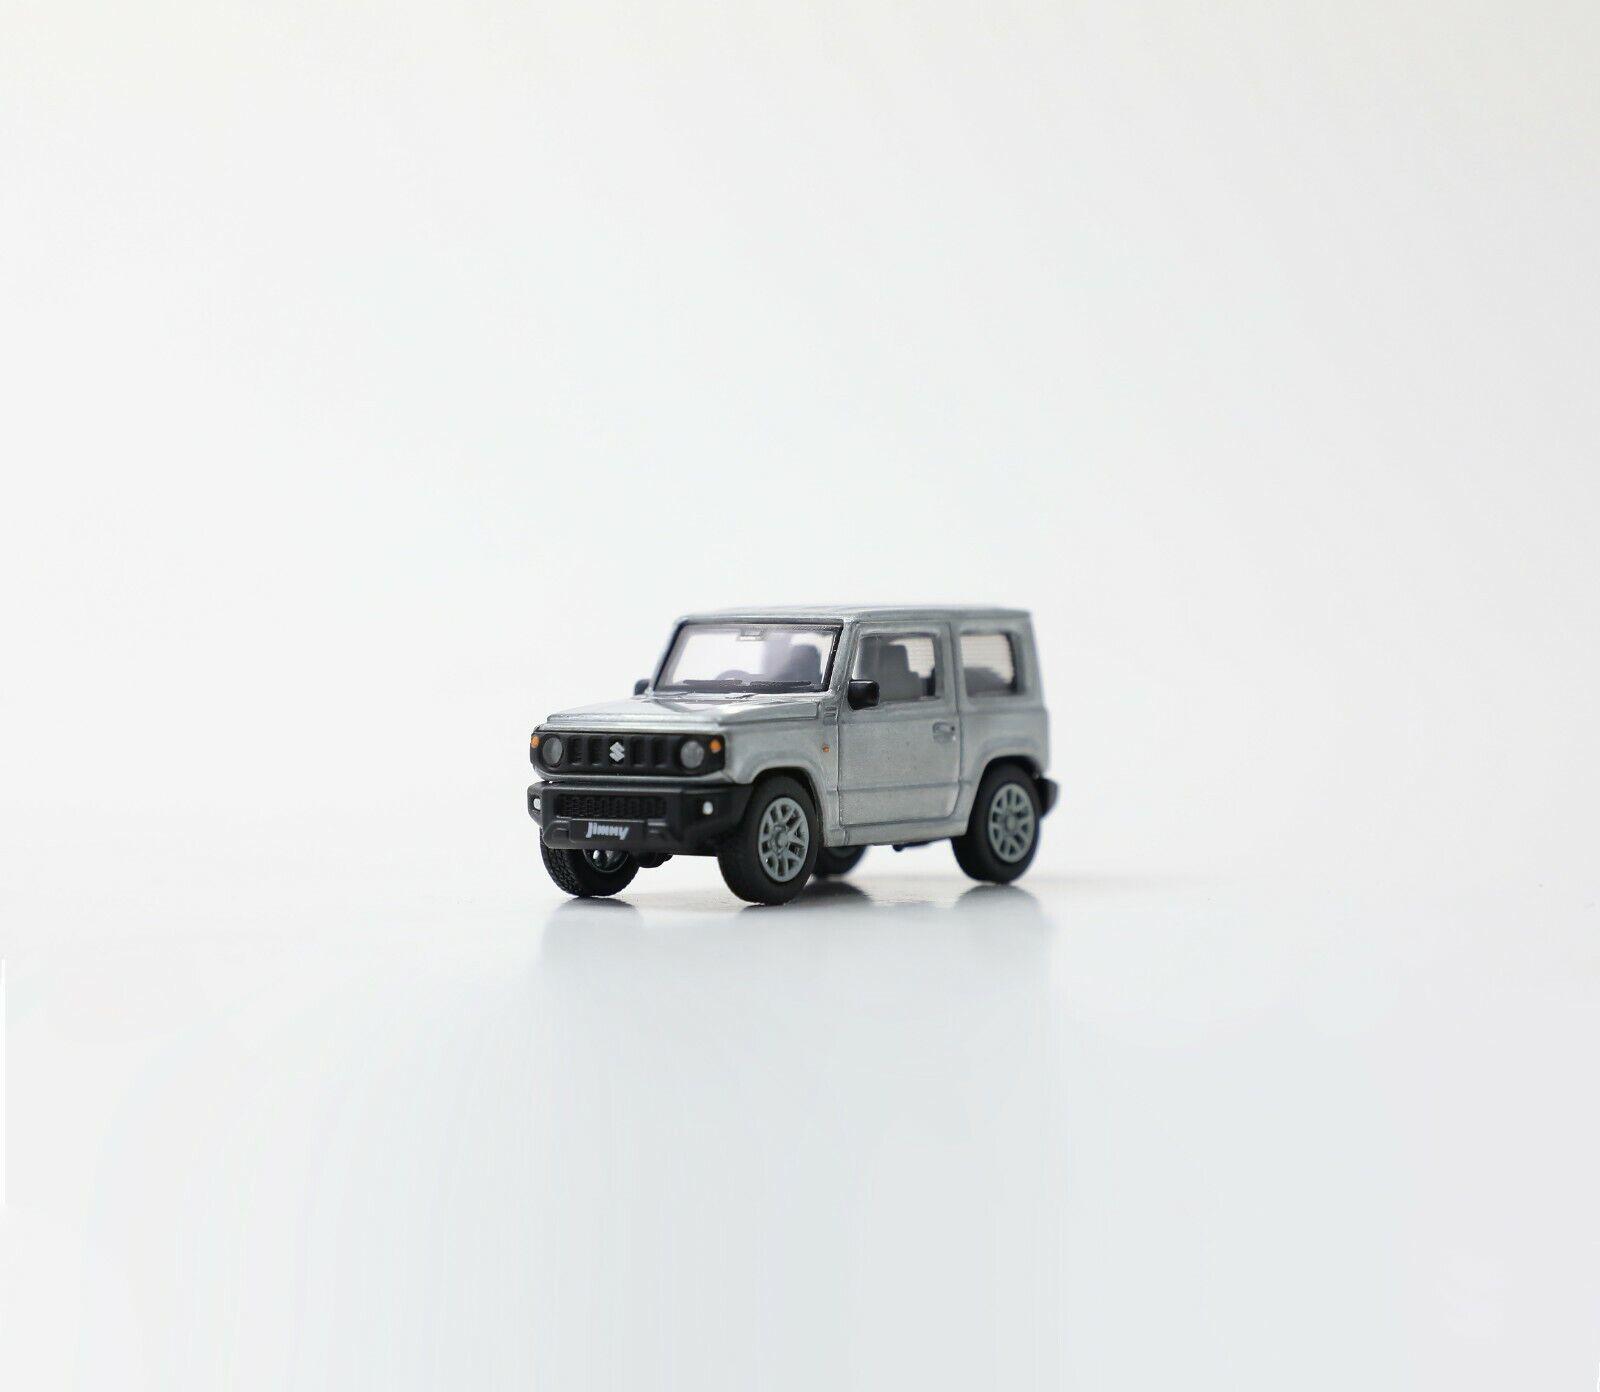 1 64 Suzuki Jimny Jimny Sierra särskild Edition Dorlop tärningskast RHD Semi Gloss